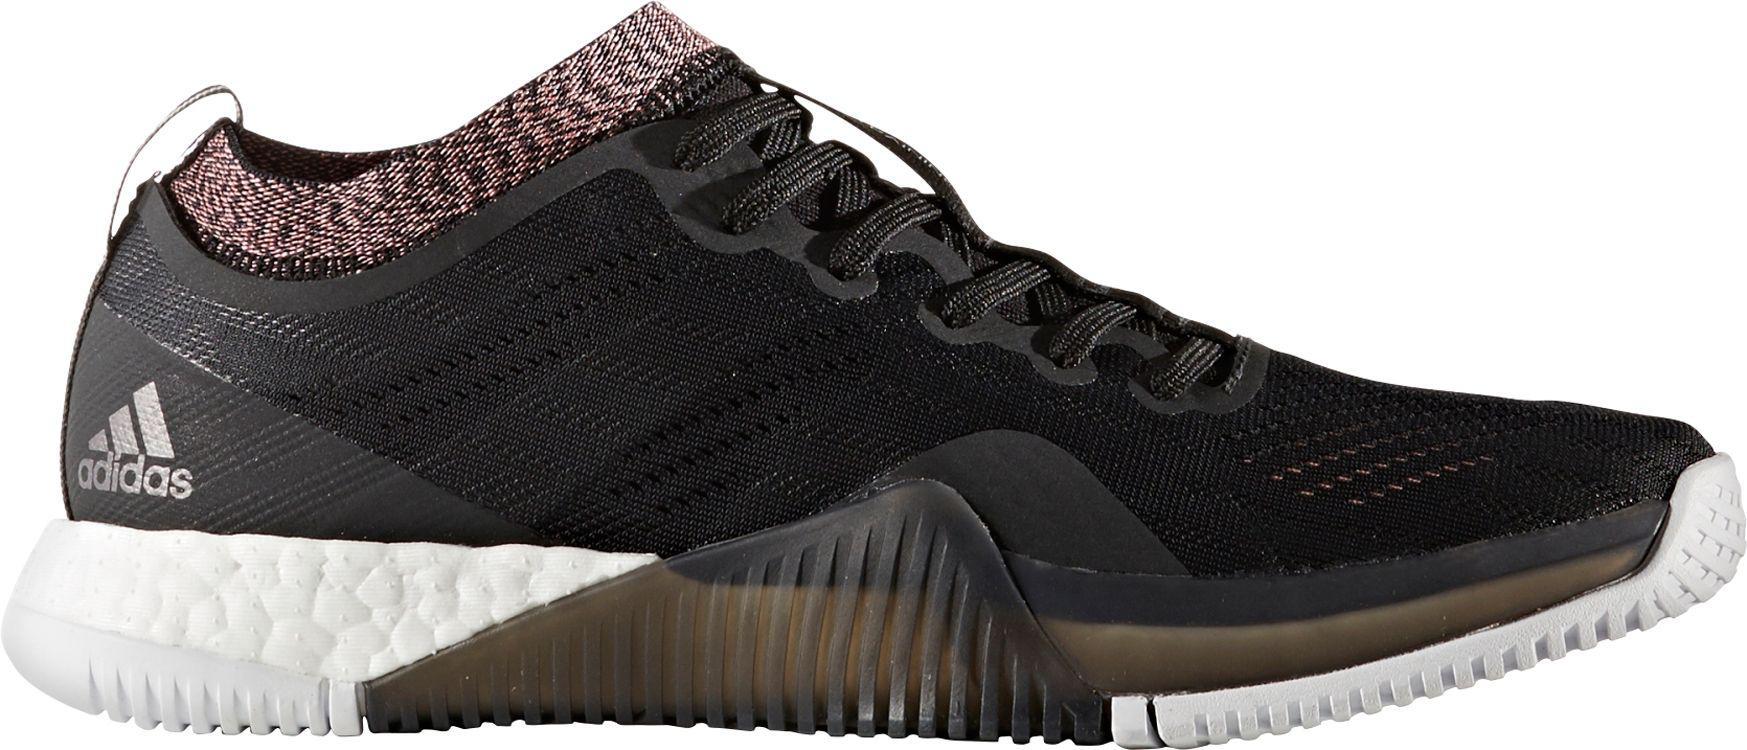 innovative design ab645 9e58b adidas Crazytrain Elite Training Shoes in Black - Lyst